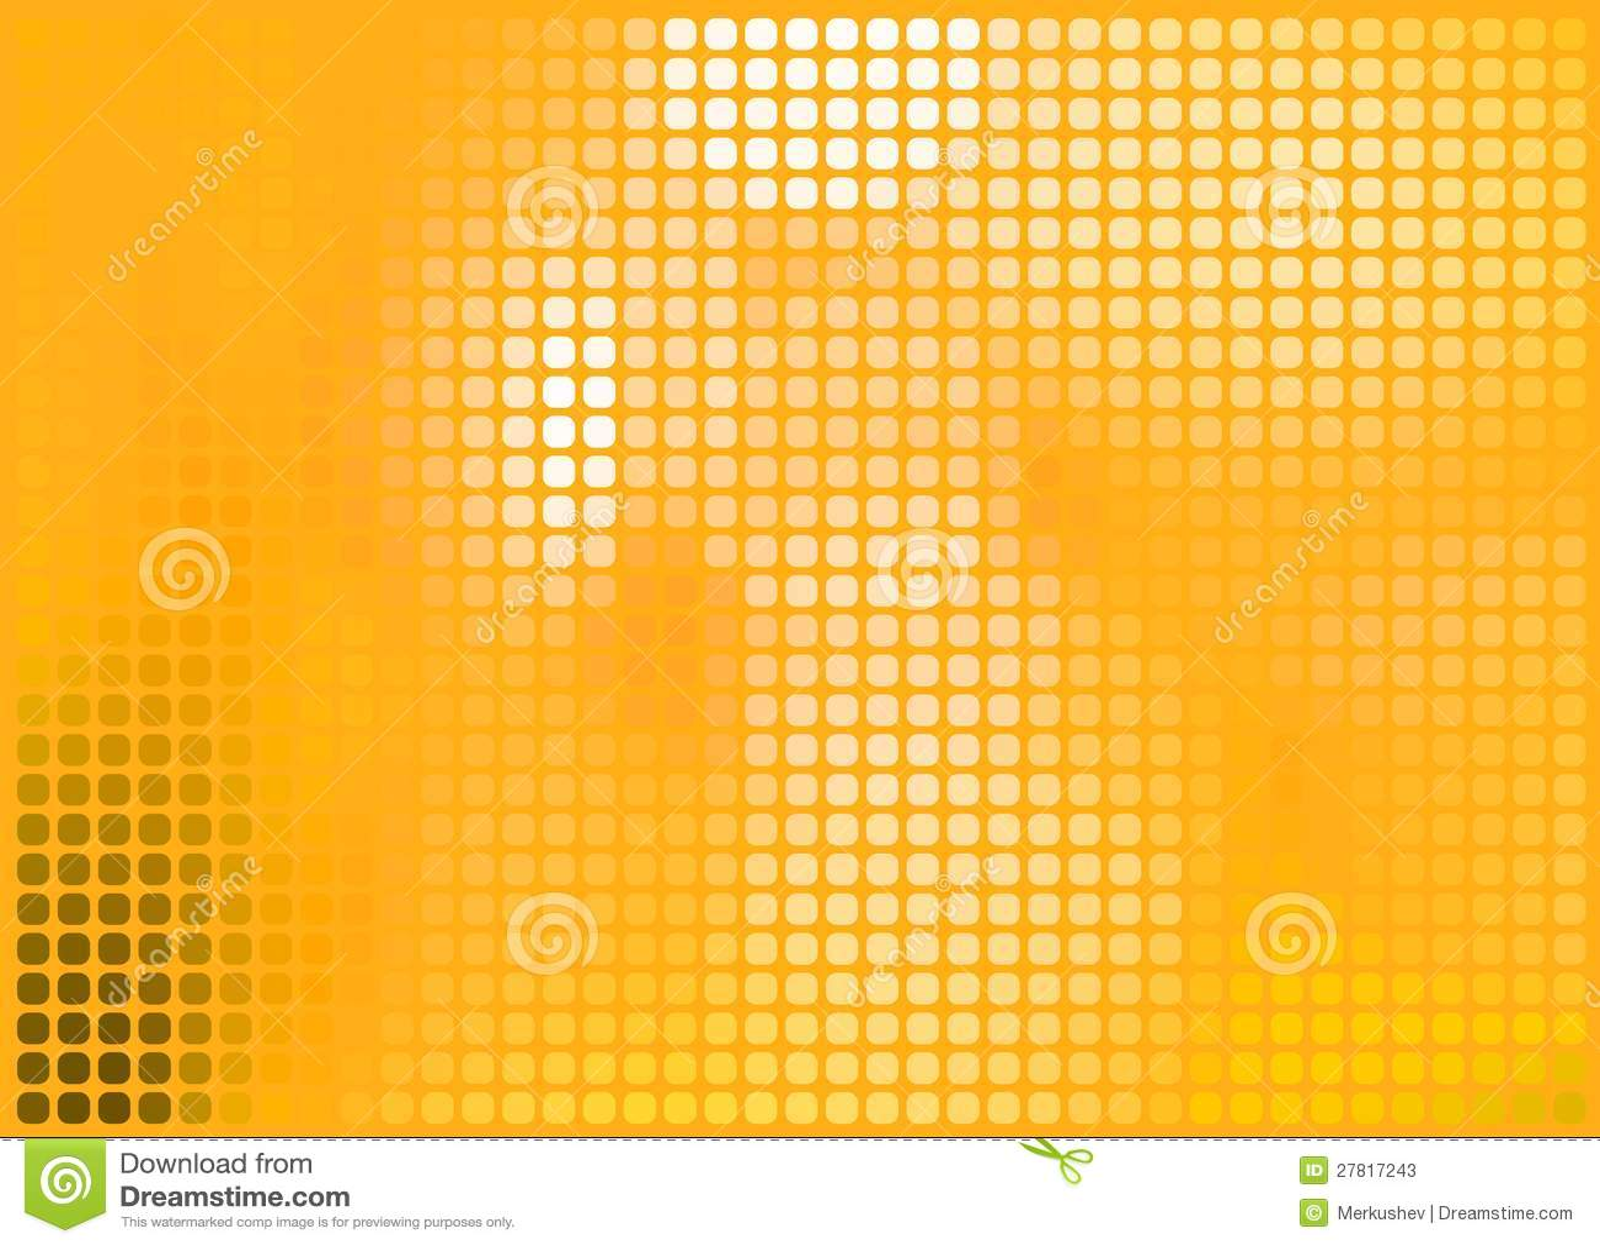 Orange Abstract Background, Vector Illustration Stock ...